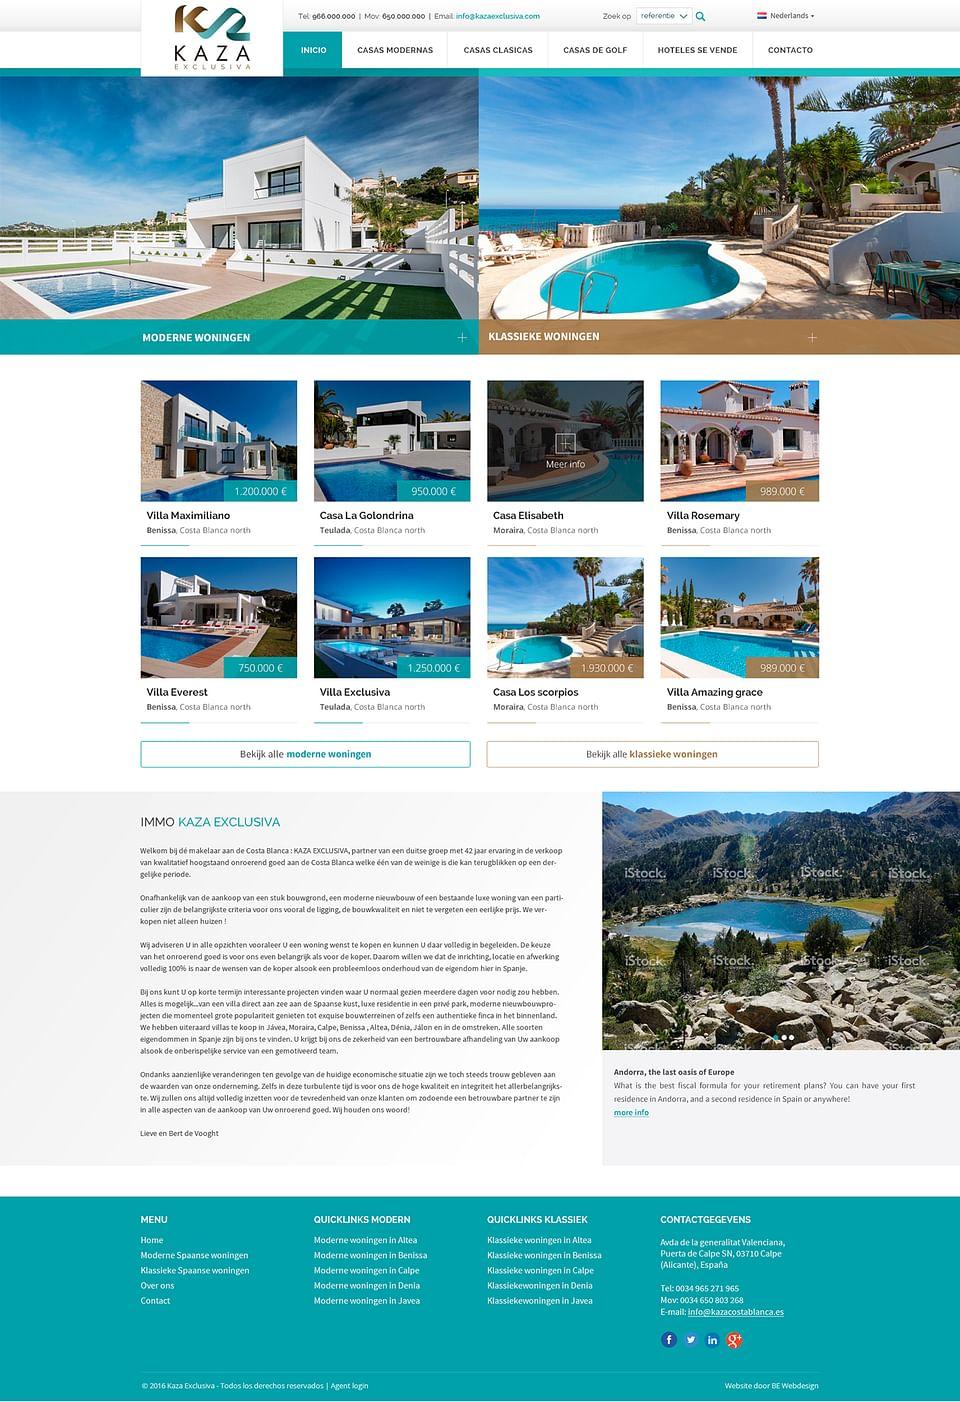 Página Web inmobiliaria para Kaza Exclusiva